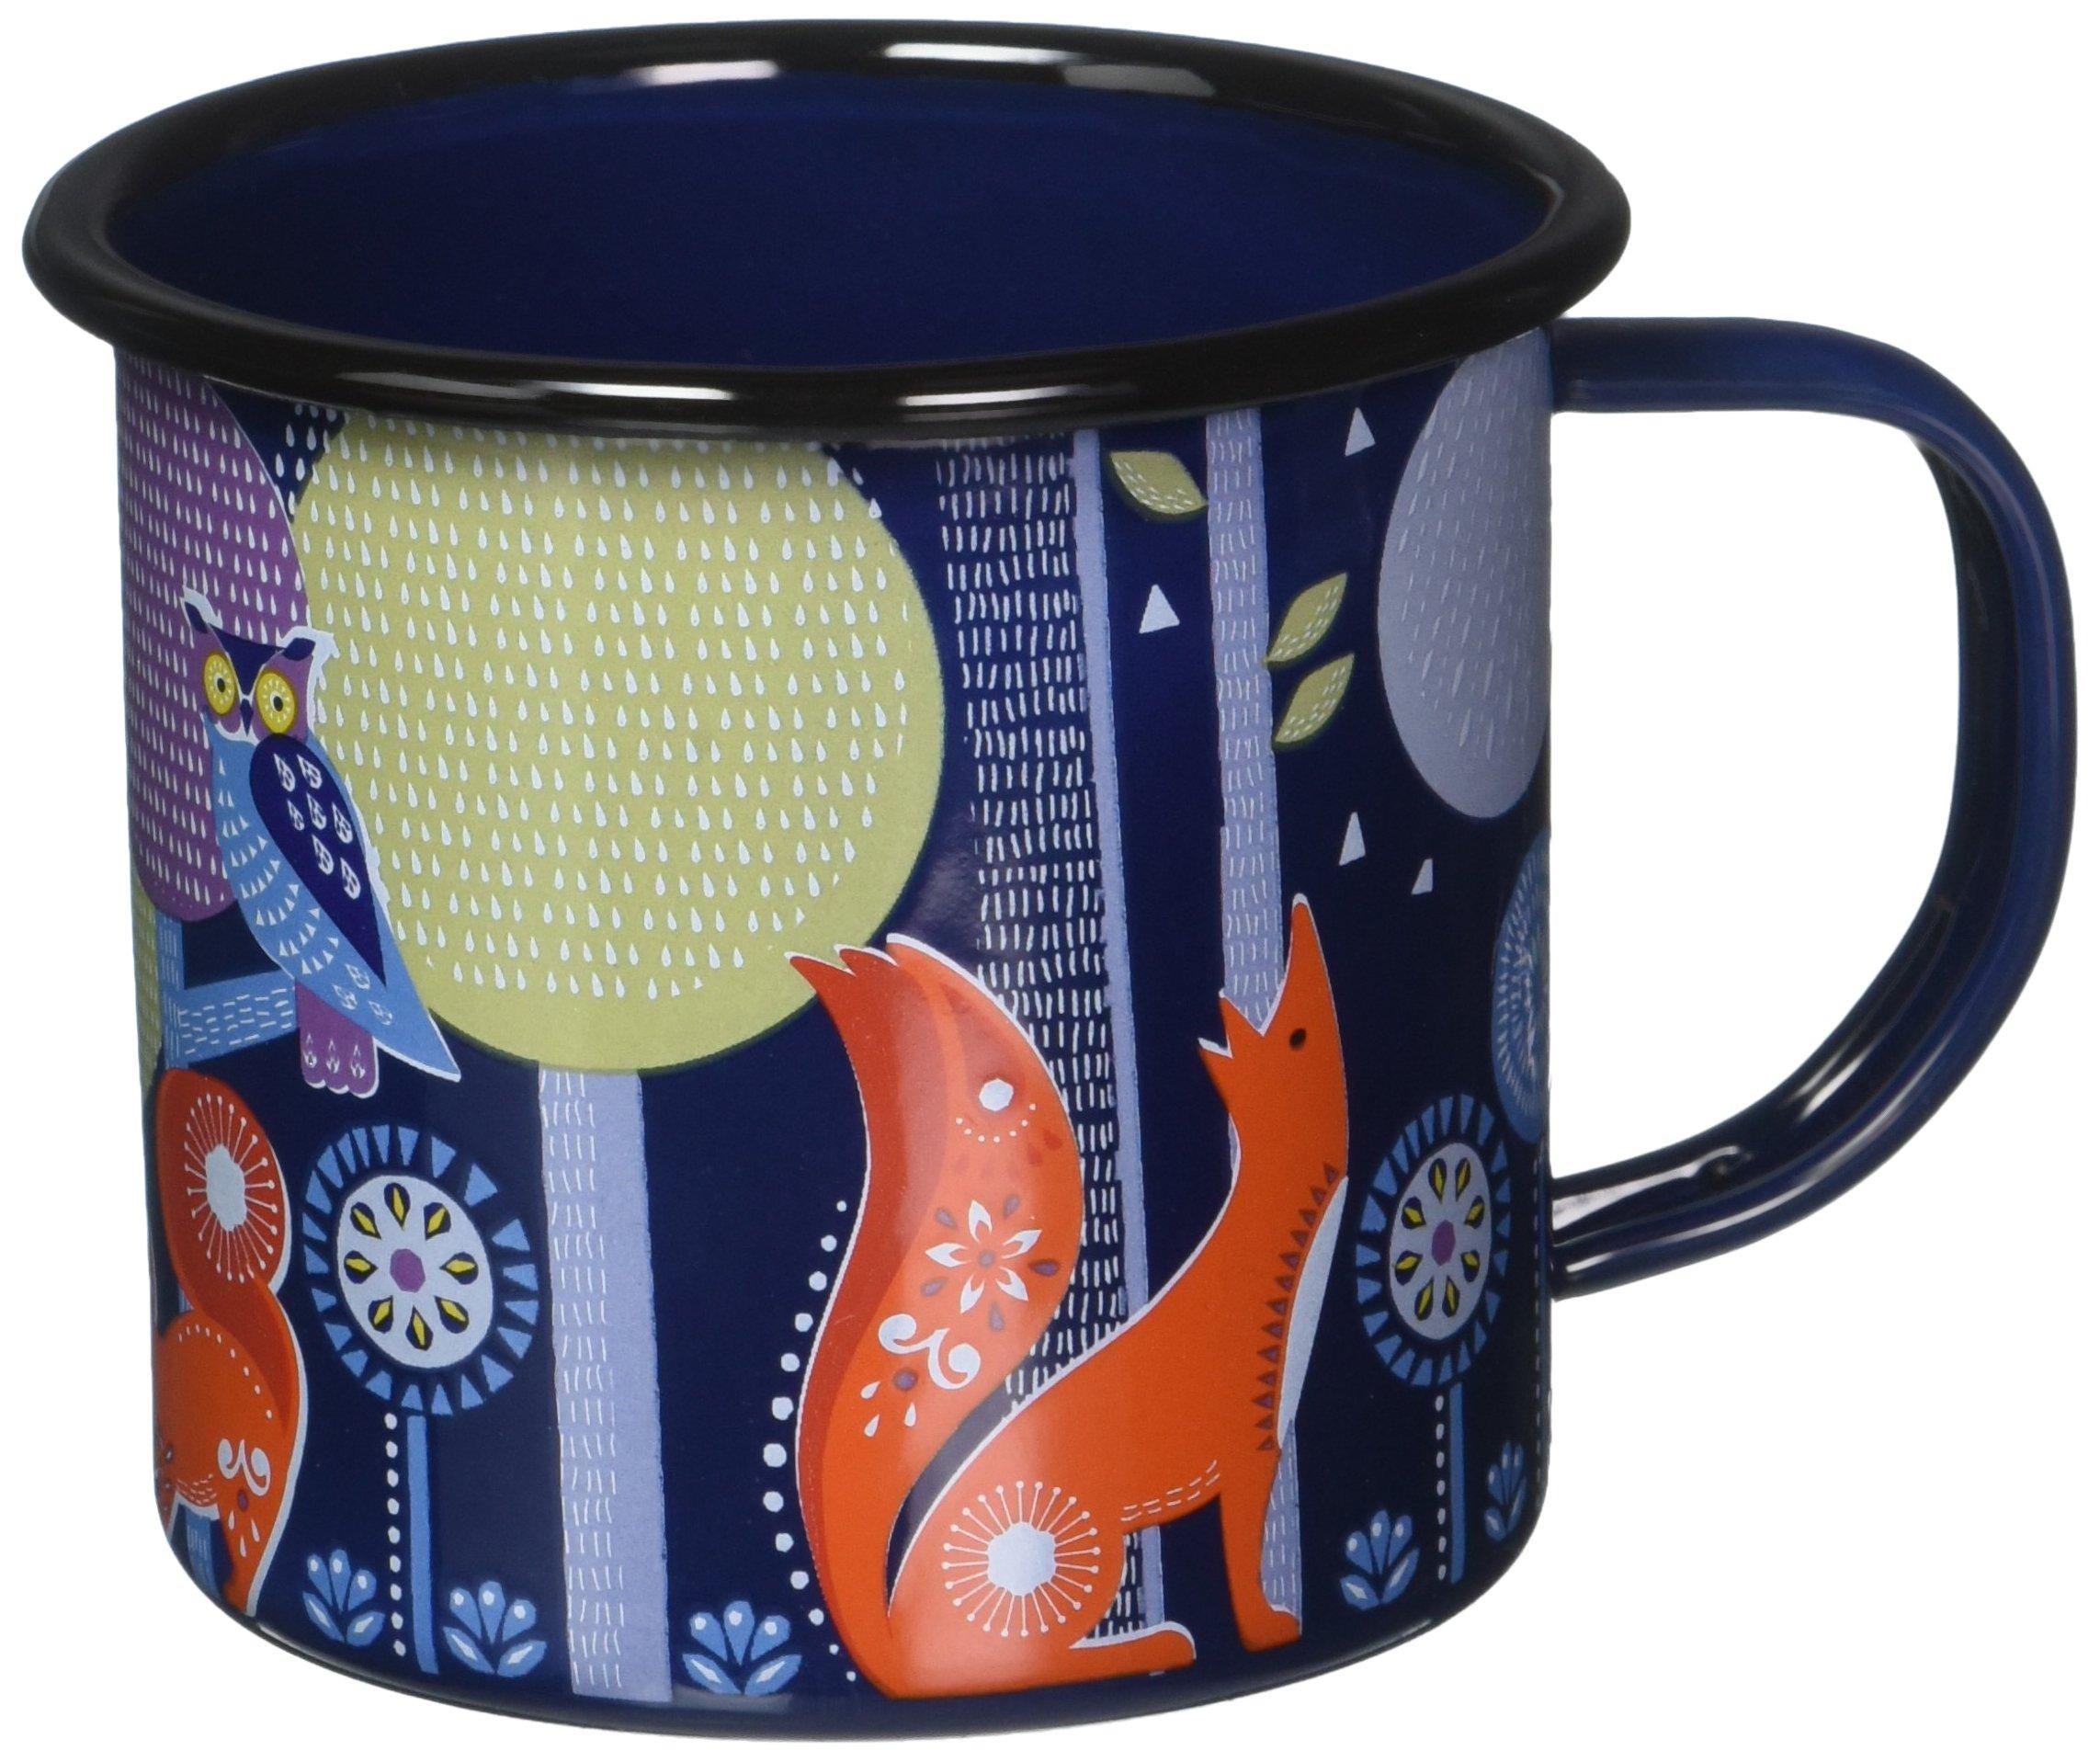 Folklore Enamel Camping Coffee Mug, Night Design, Blue (14 Ounces)